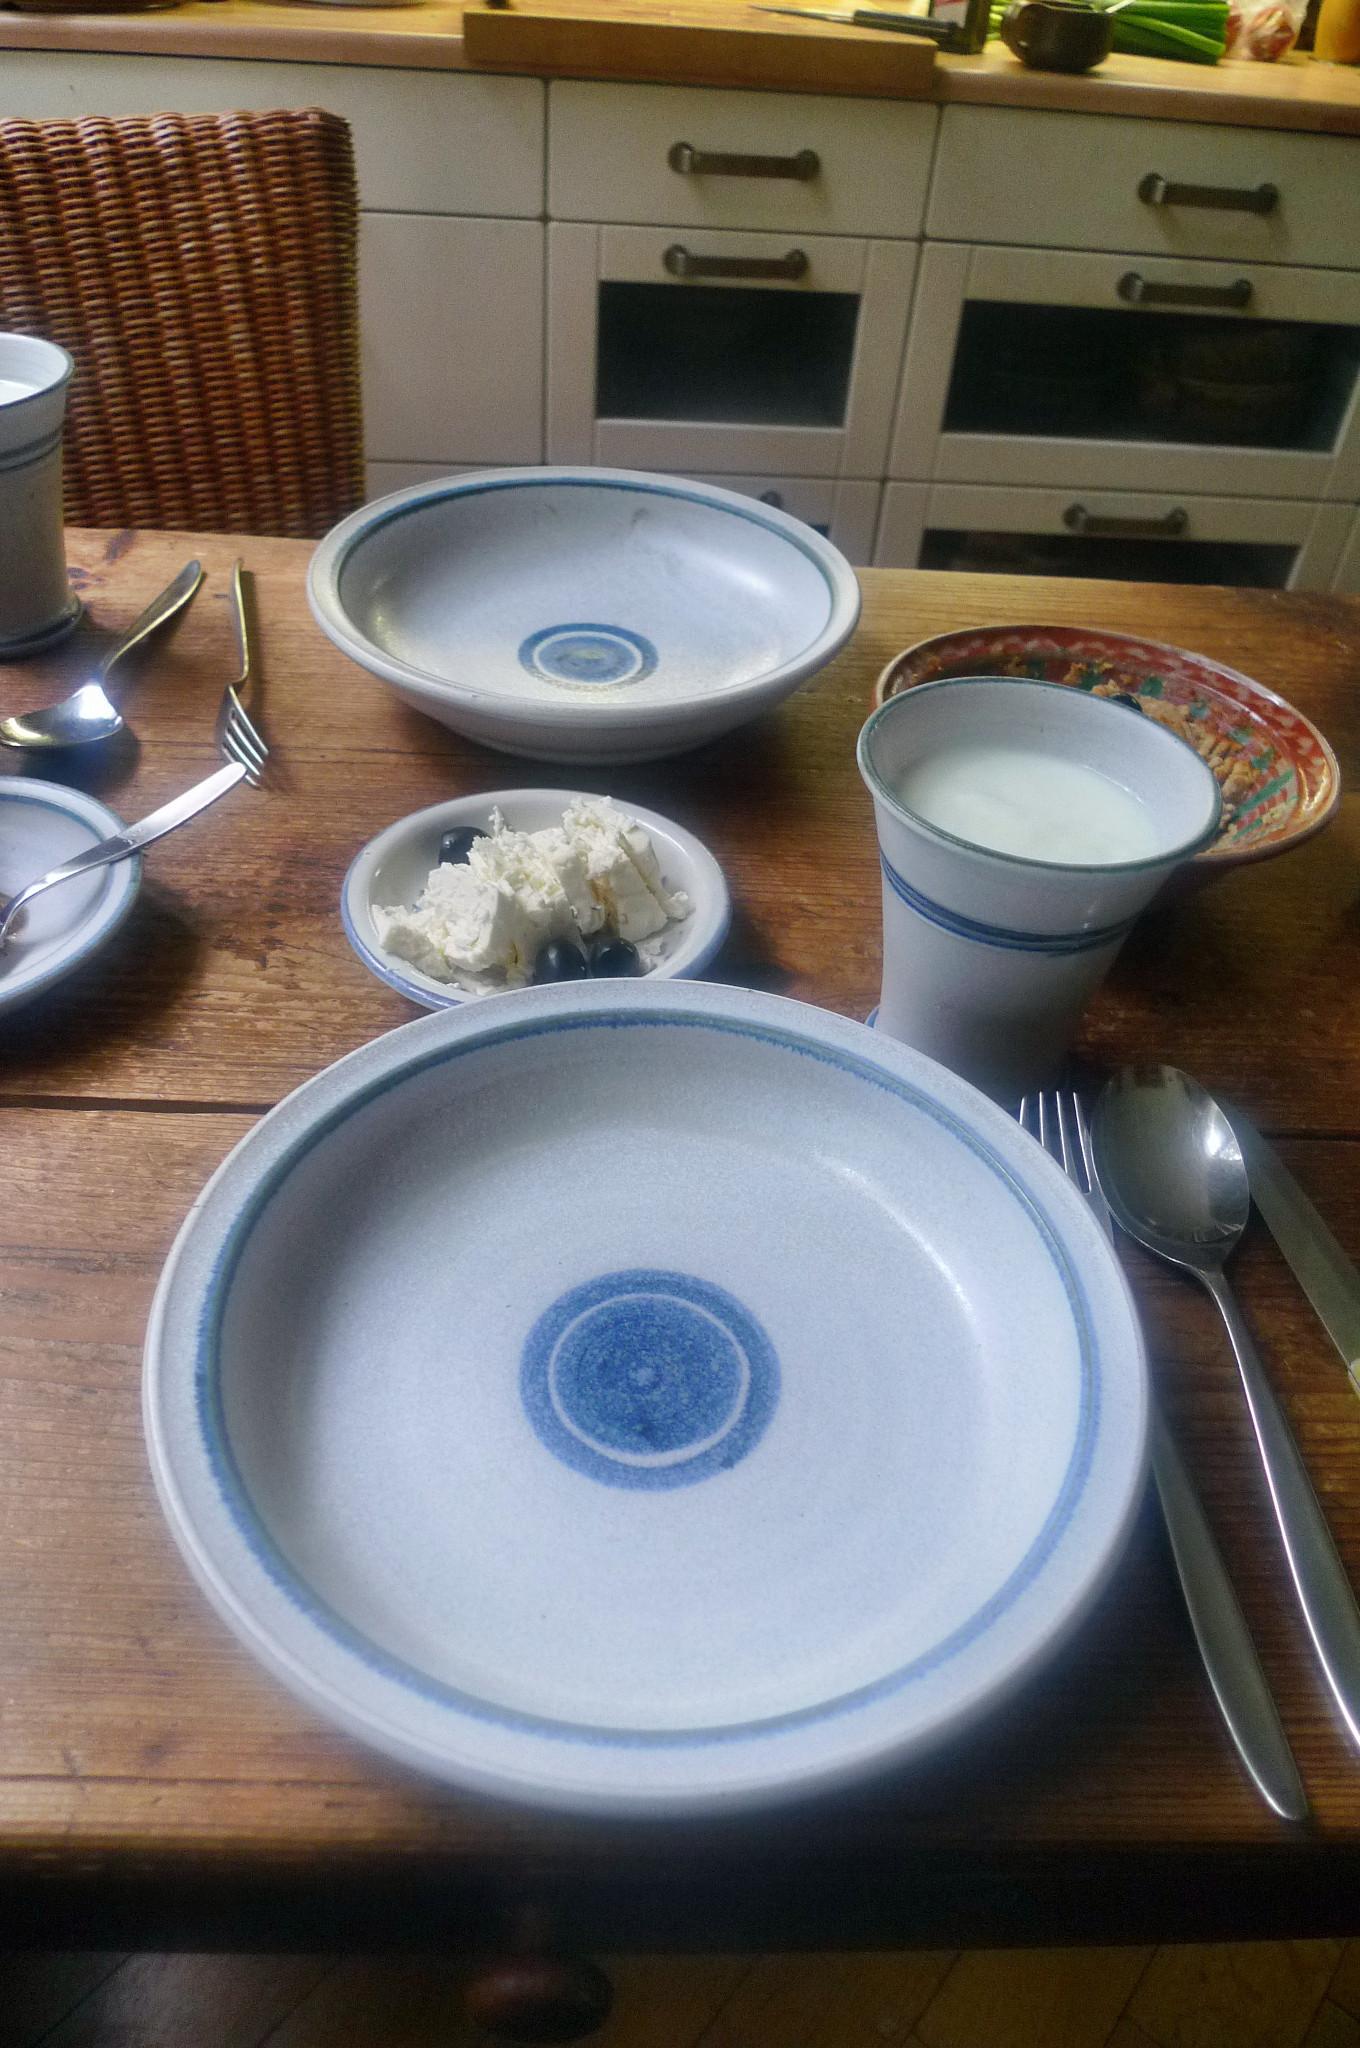 Pimentos-Paprika-Kartoffel-Salat-Buttermilch- 28.9.14   (5)